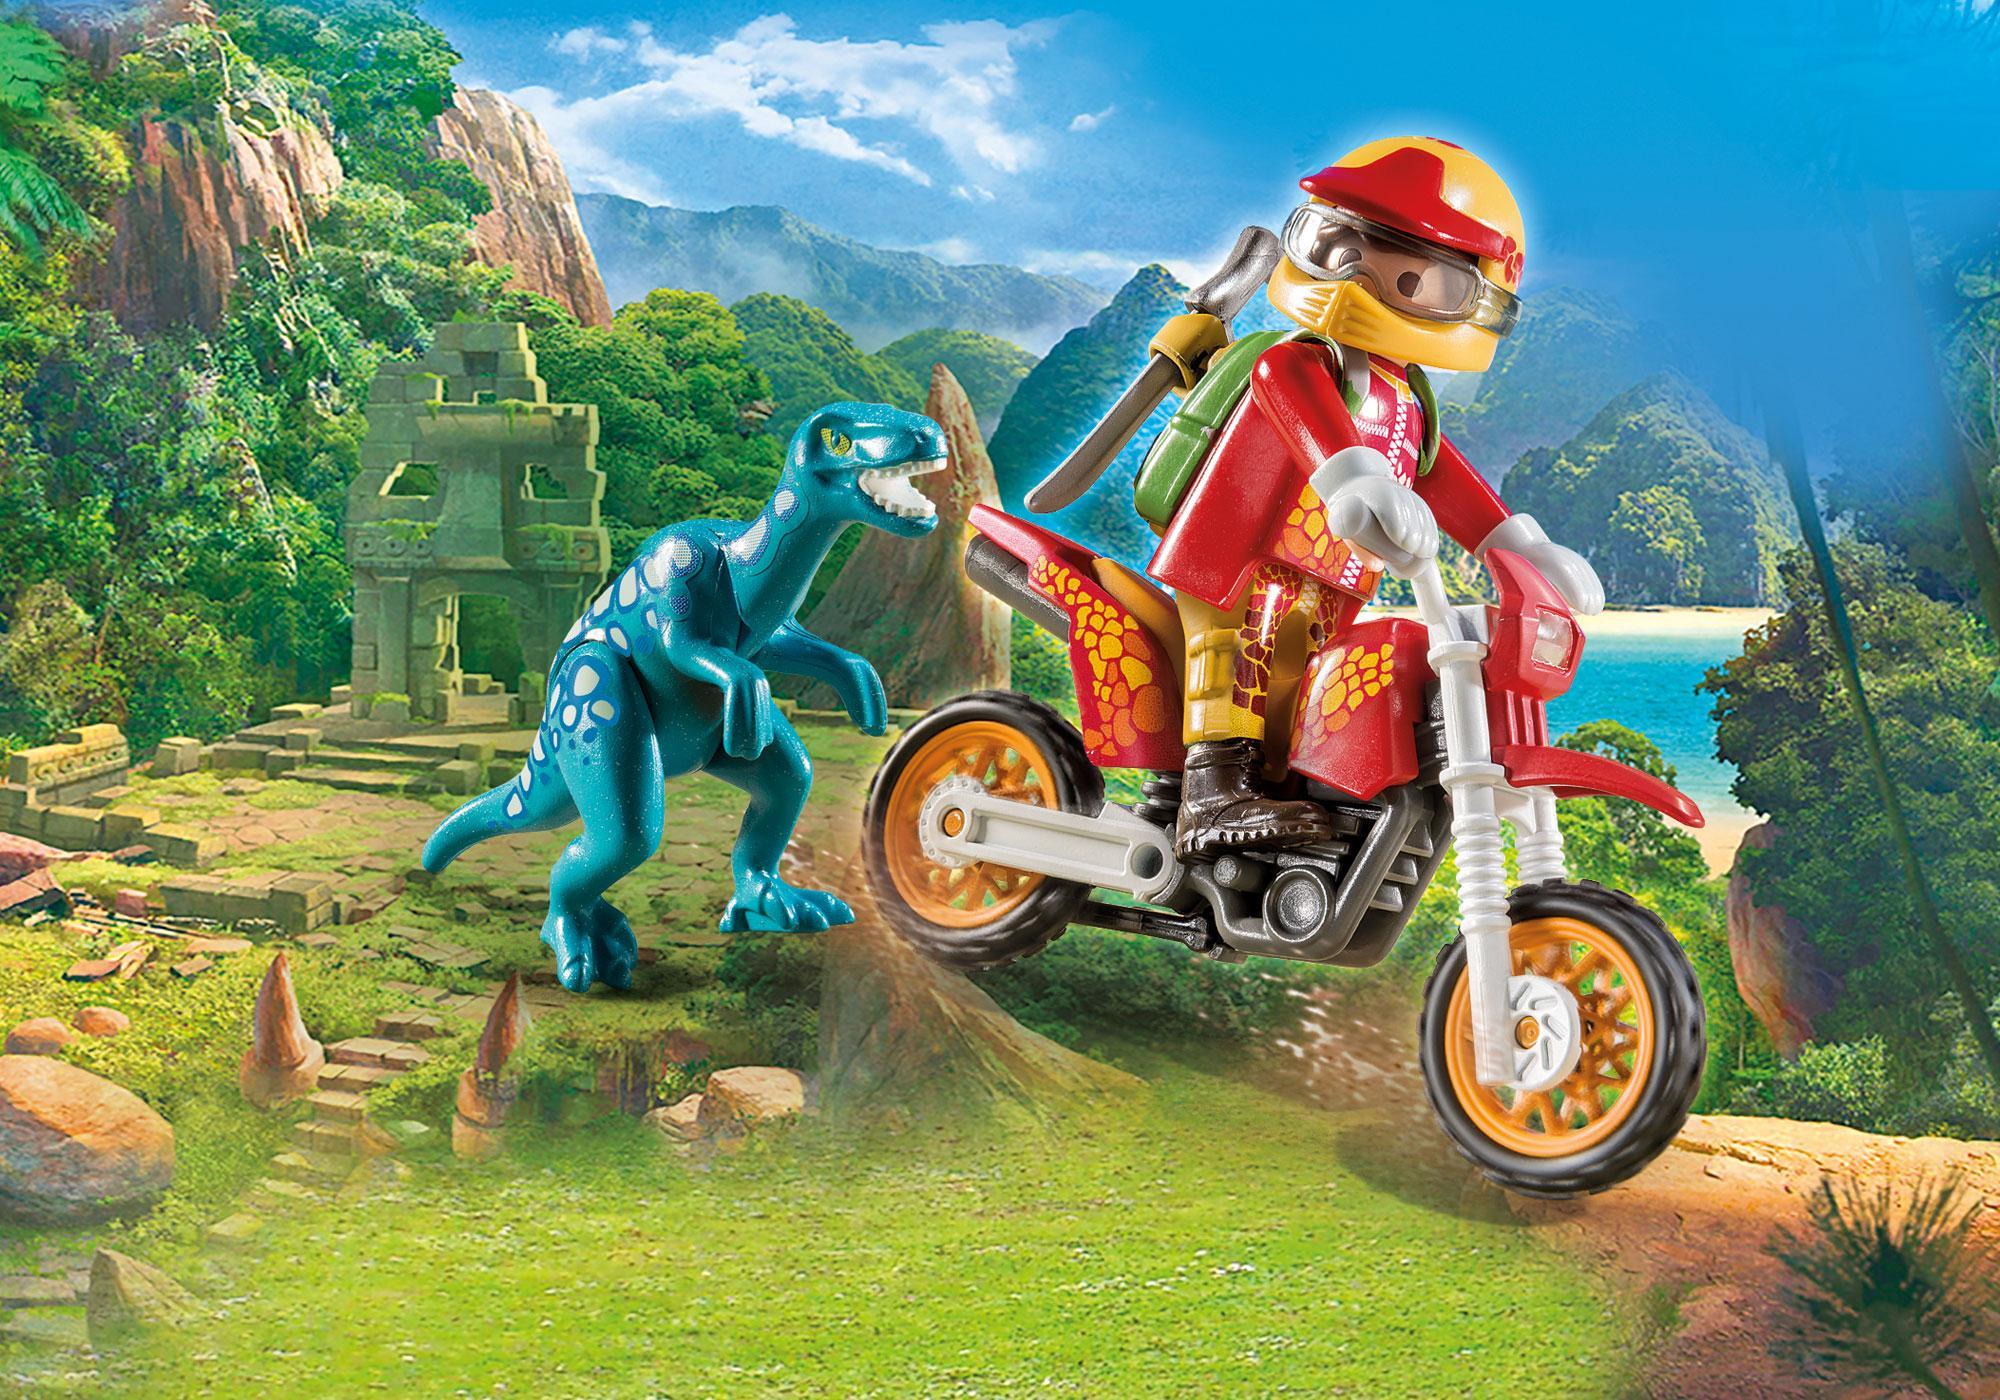 http://media.playmobil.com/i/playmobil/9431_product_detail/Εξερευνητής με Motocross και μικρό δεινόσαυρο